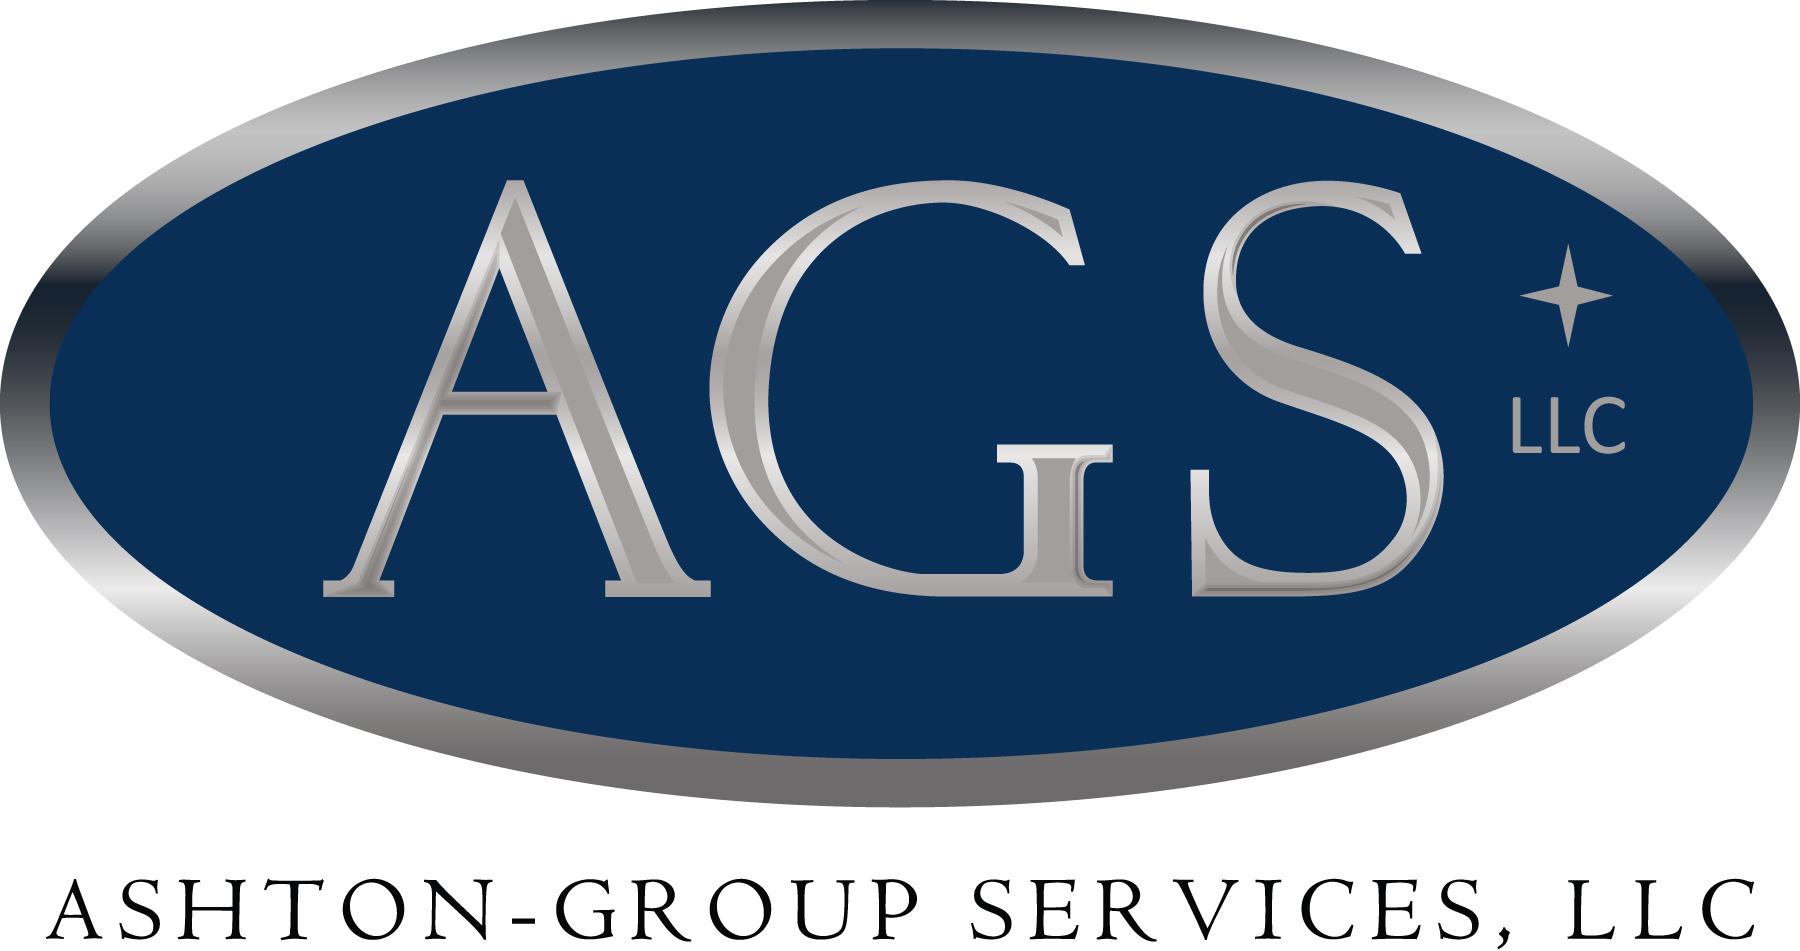 ags-logo-name.jpg